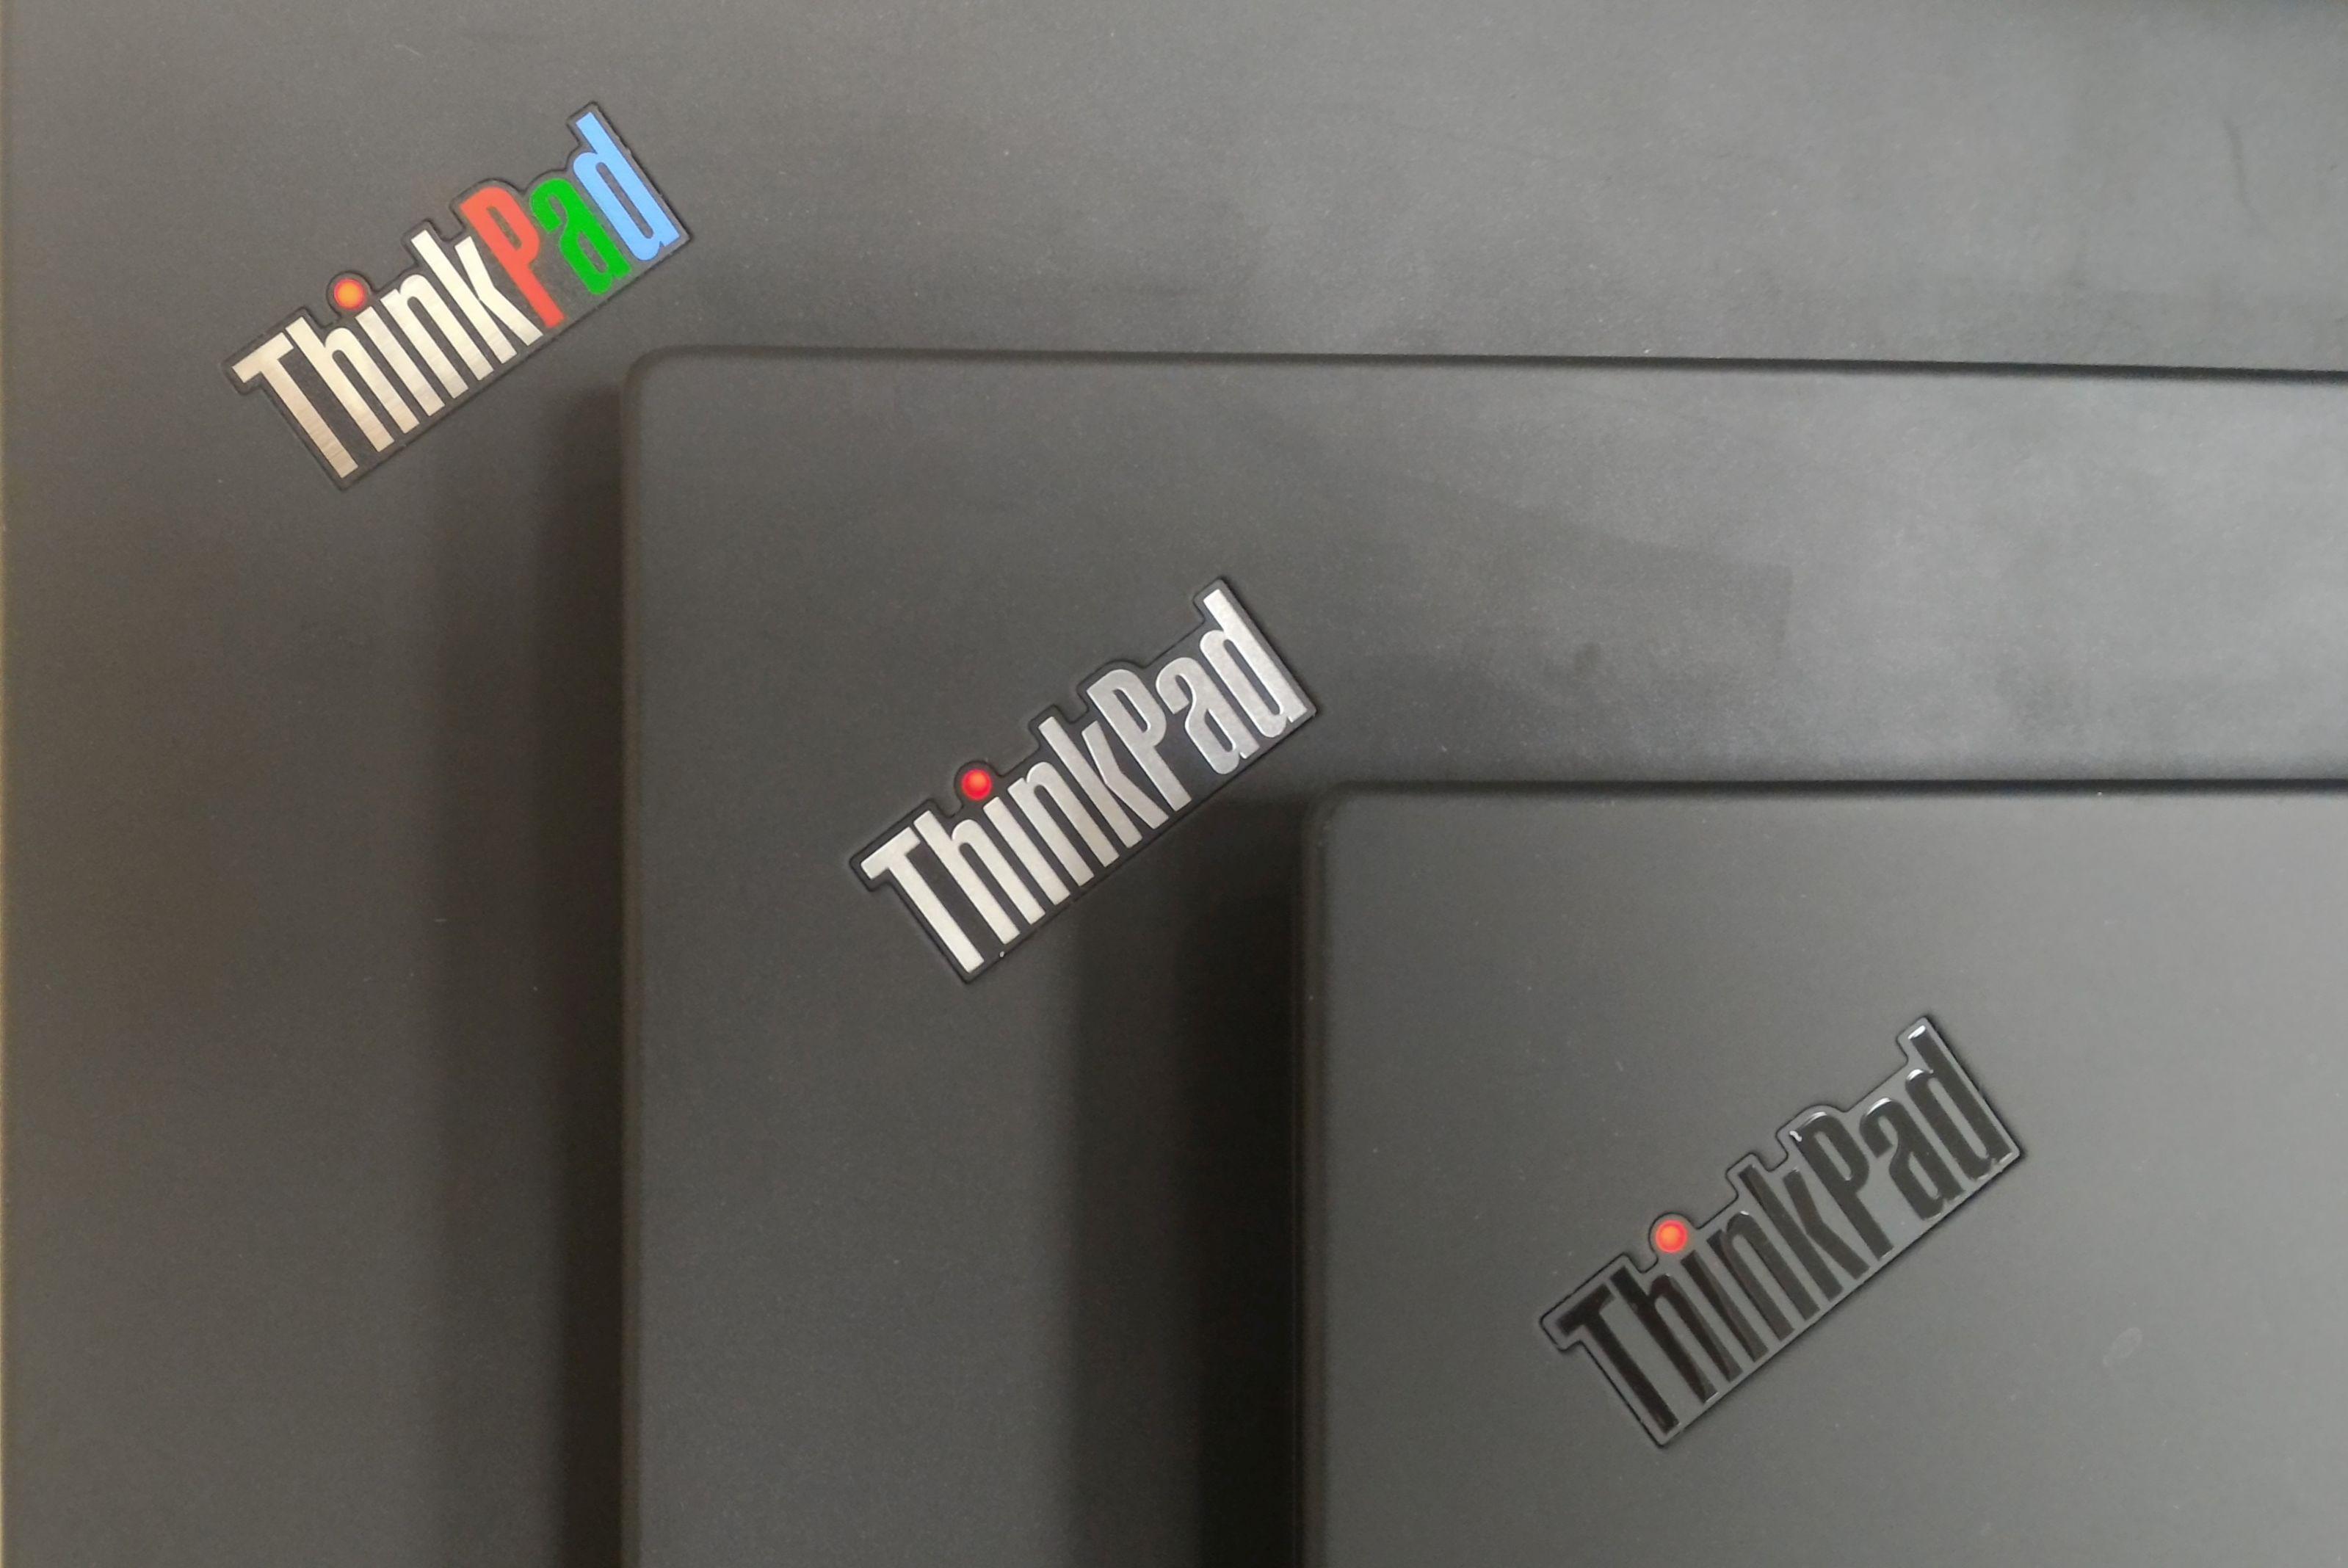 Thinkpad 25 vs X1 Carbon 5th/6th Gen *PICS* - Thinkpads Forum